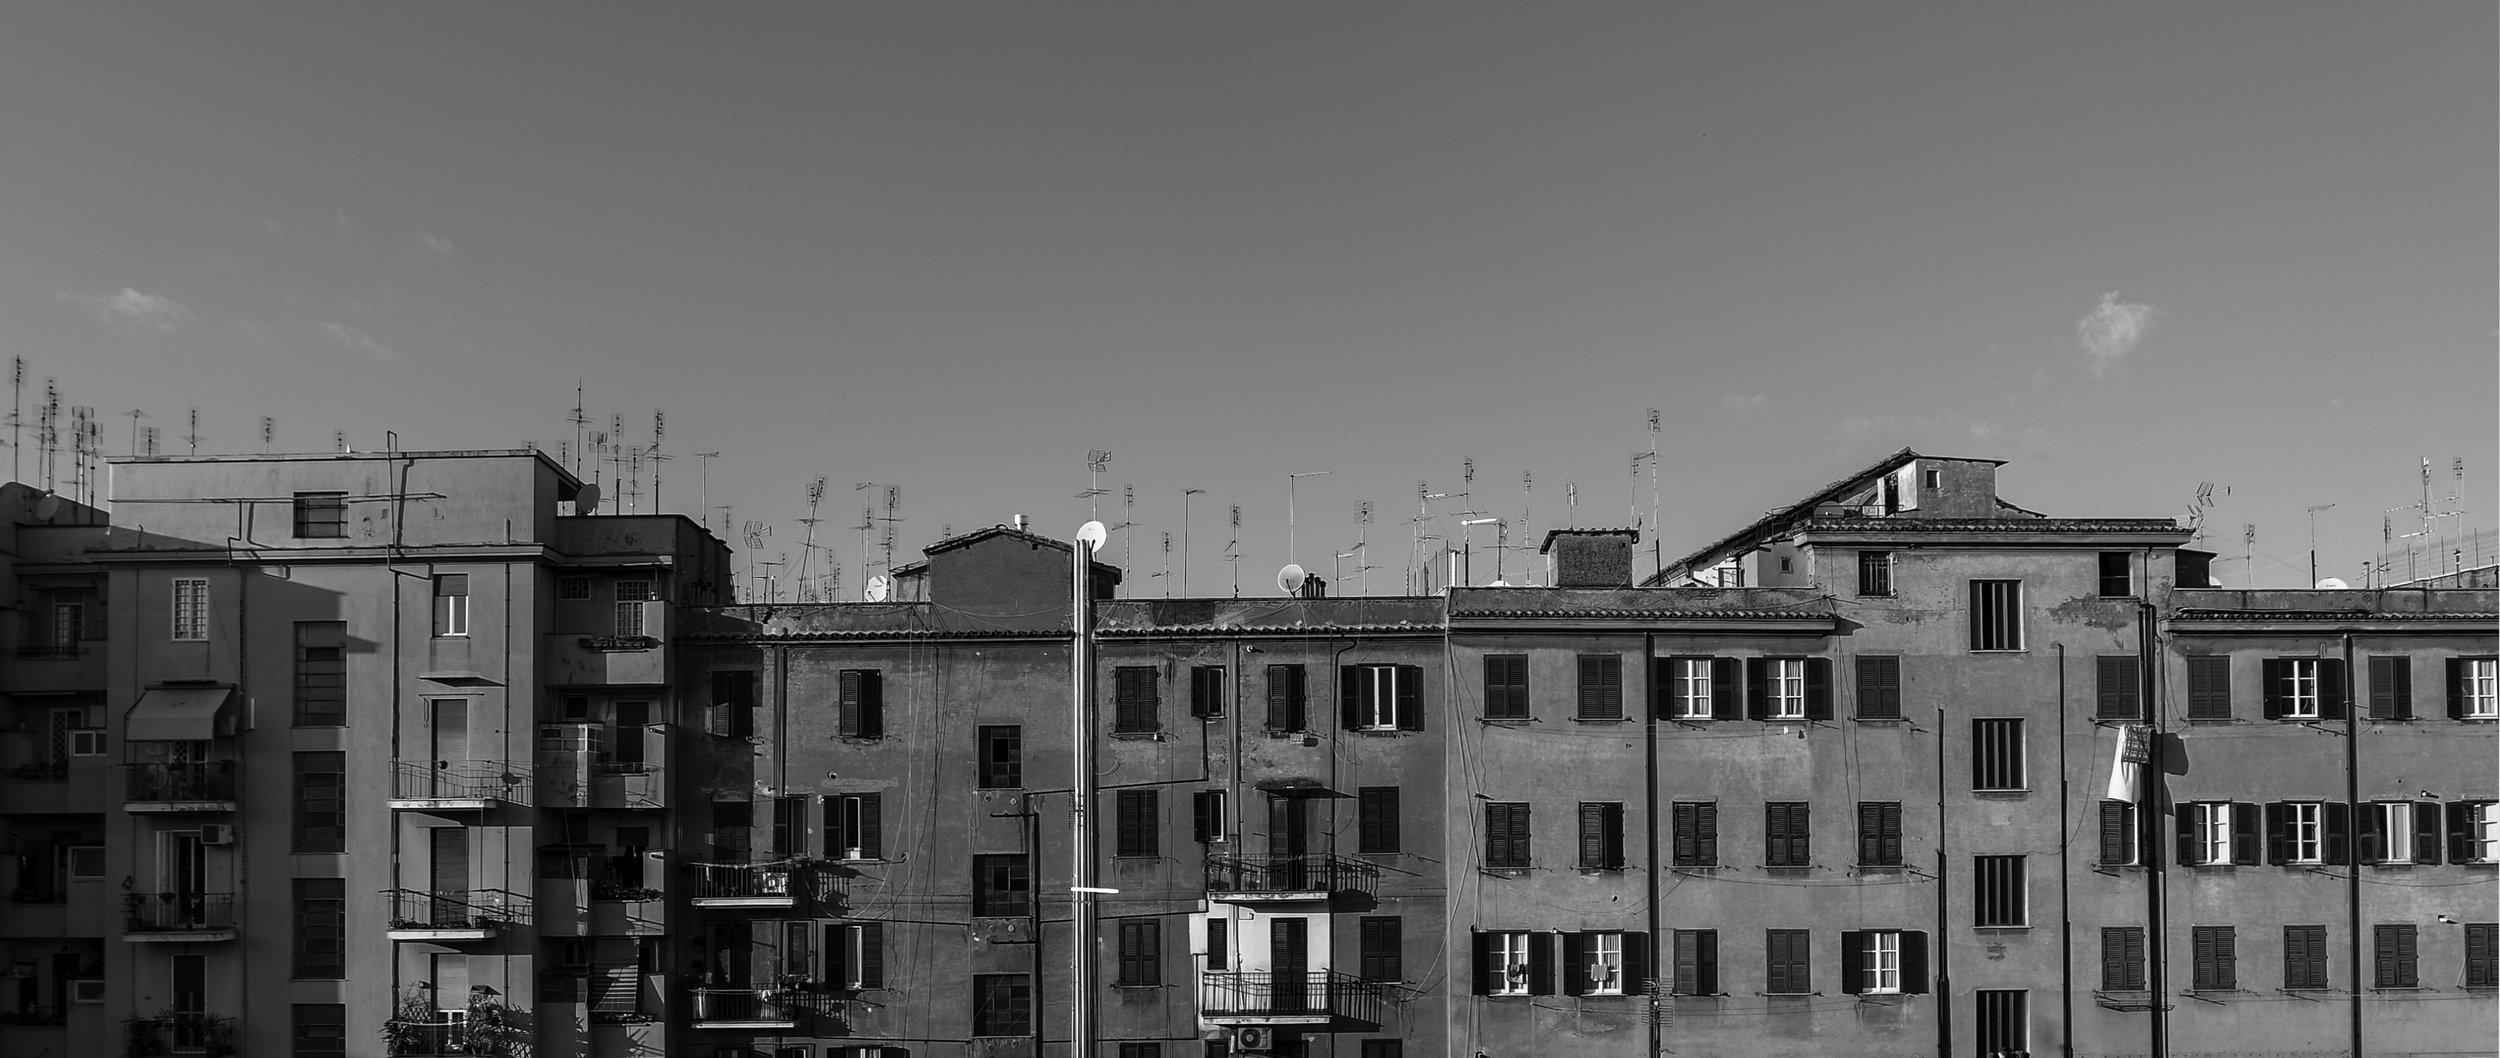 Apartmentscape_BW.jpg